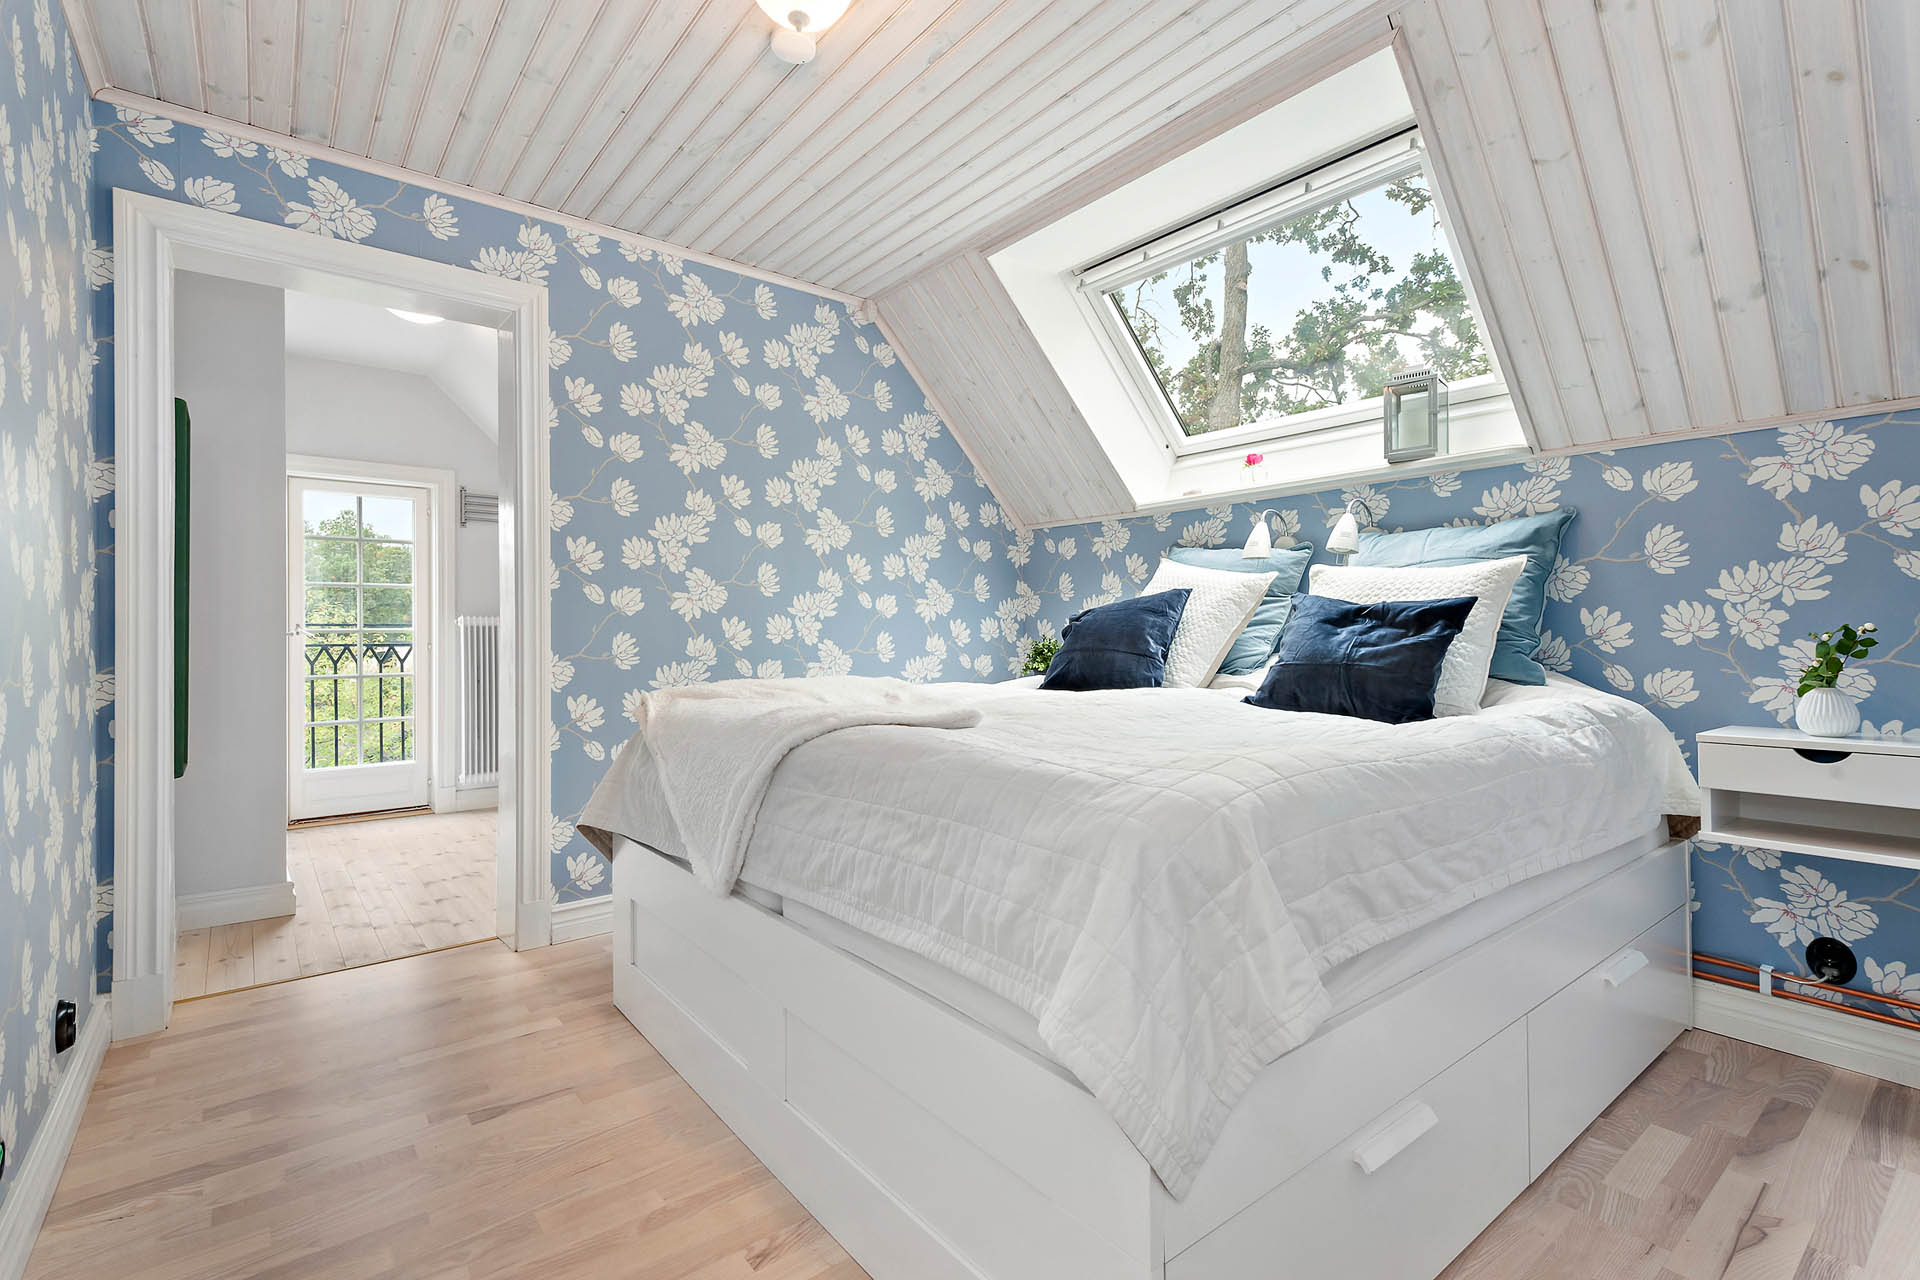 Sovrum 2 med dressingroom och badrum en suite